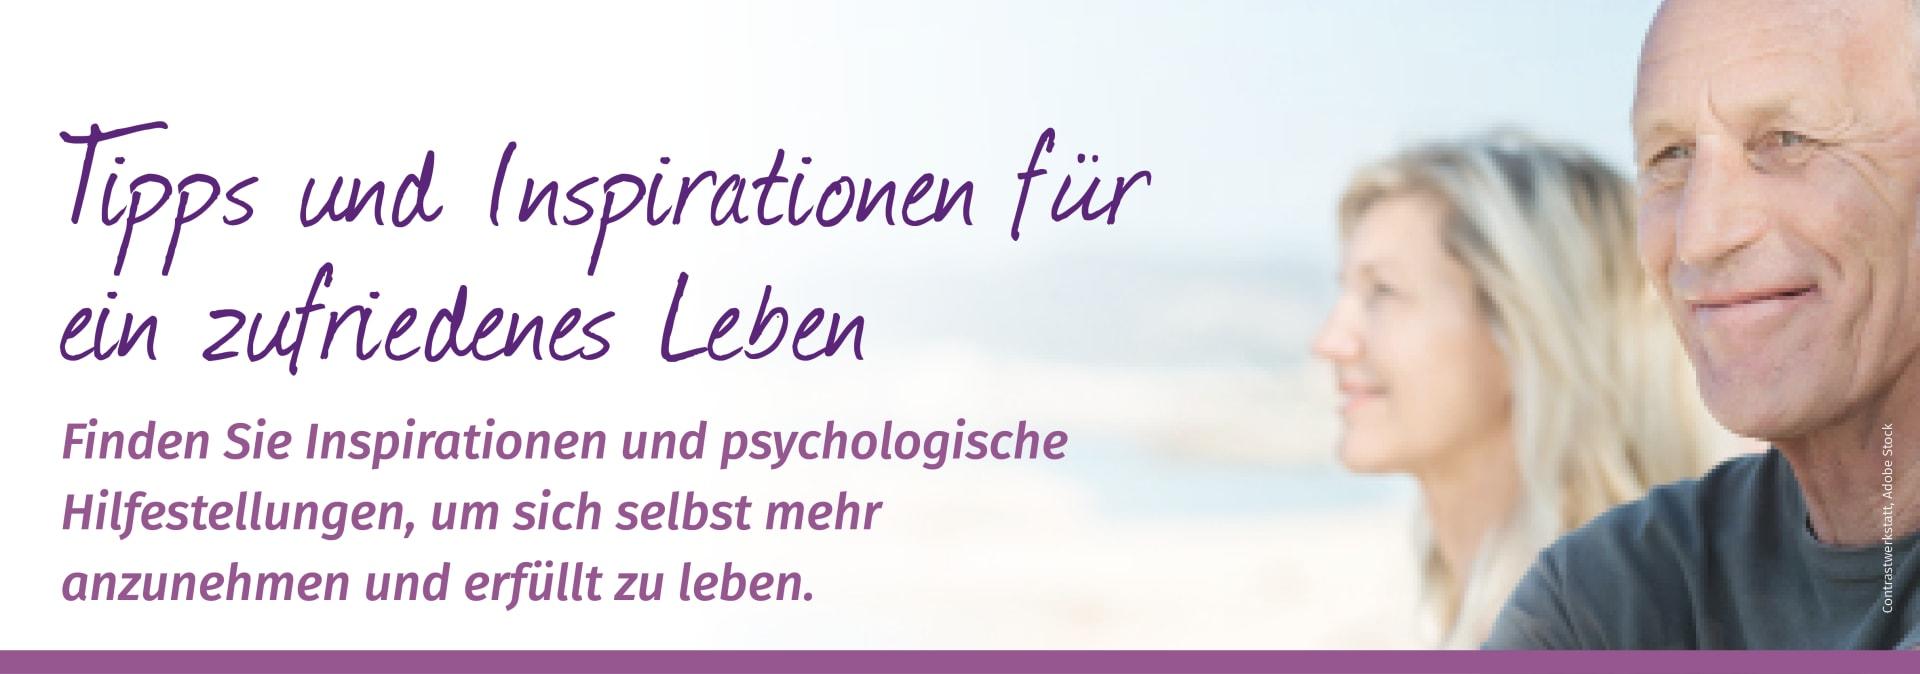 Psychotipps Moodbar - Startseite